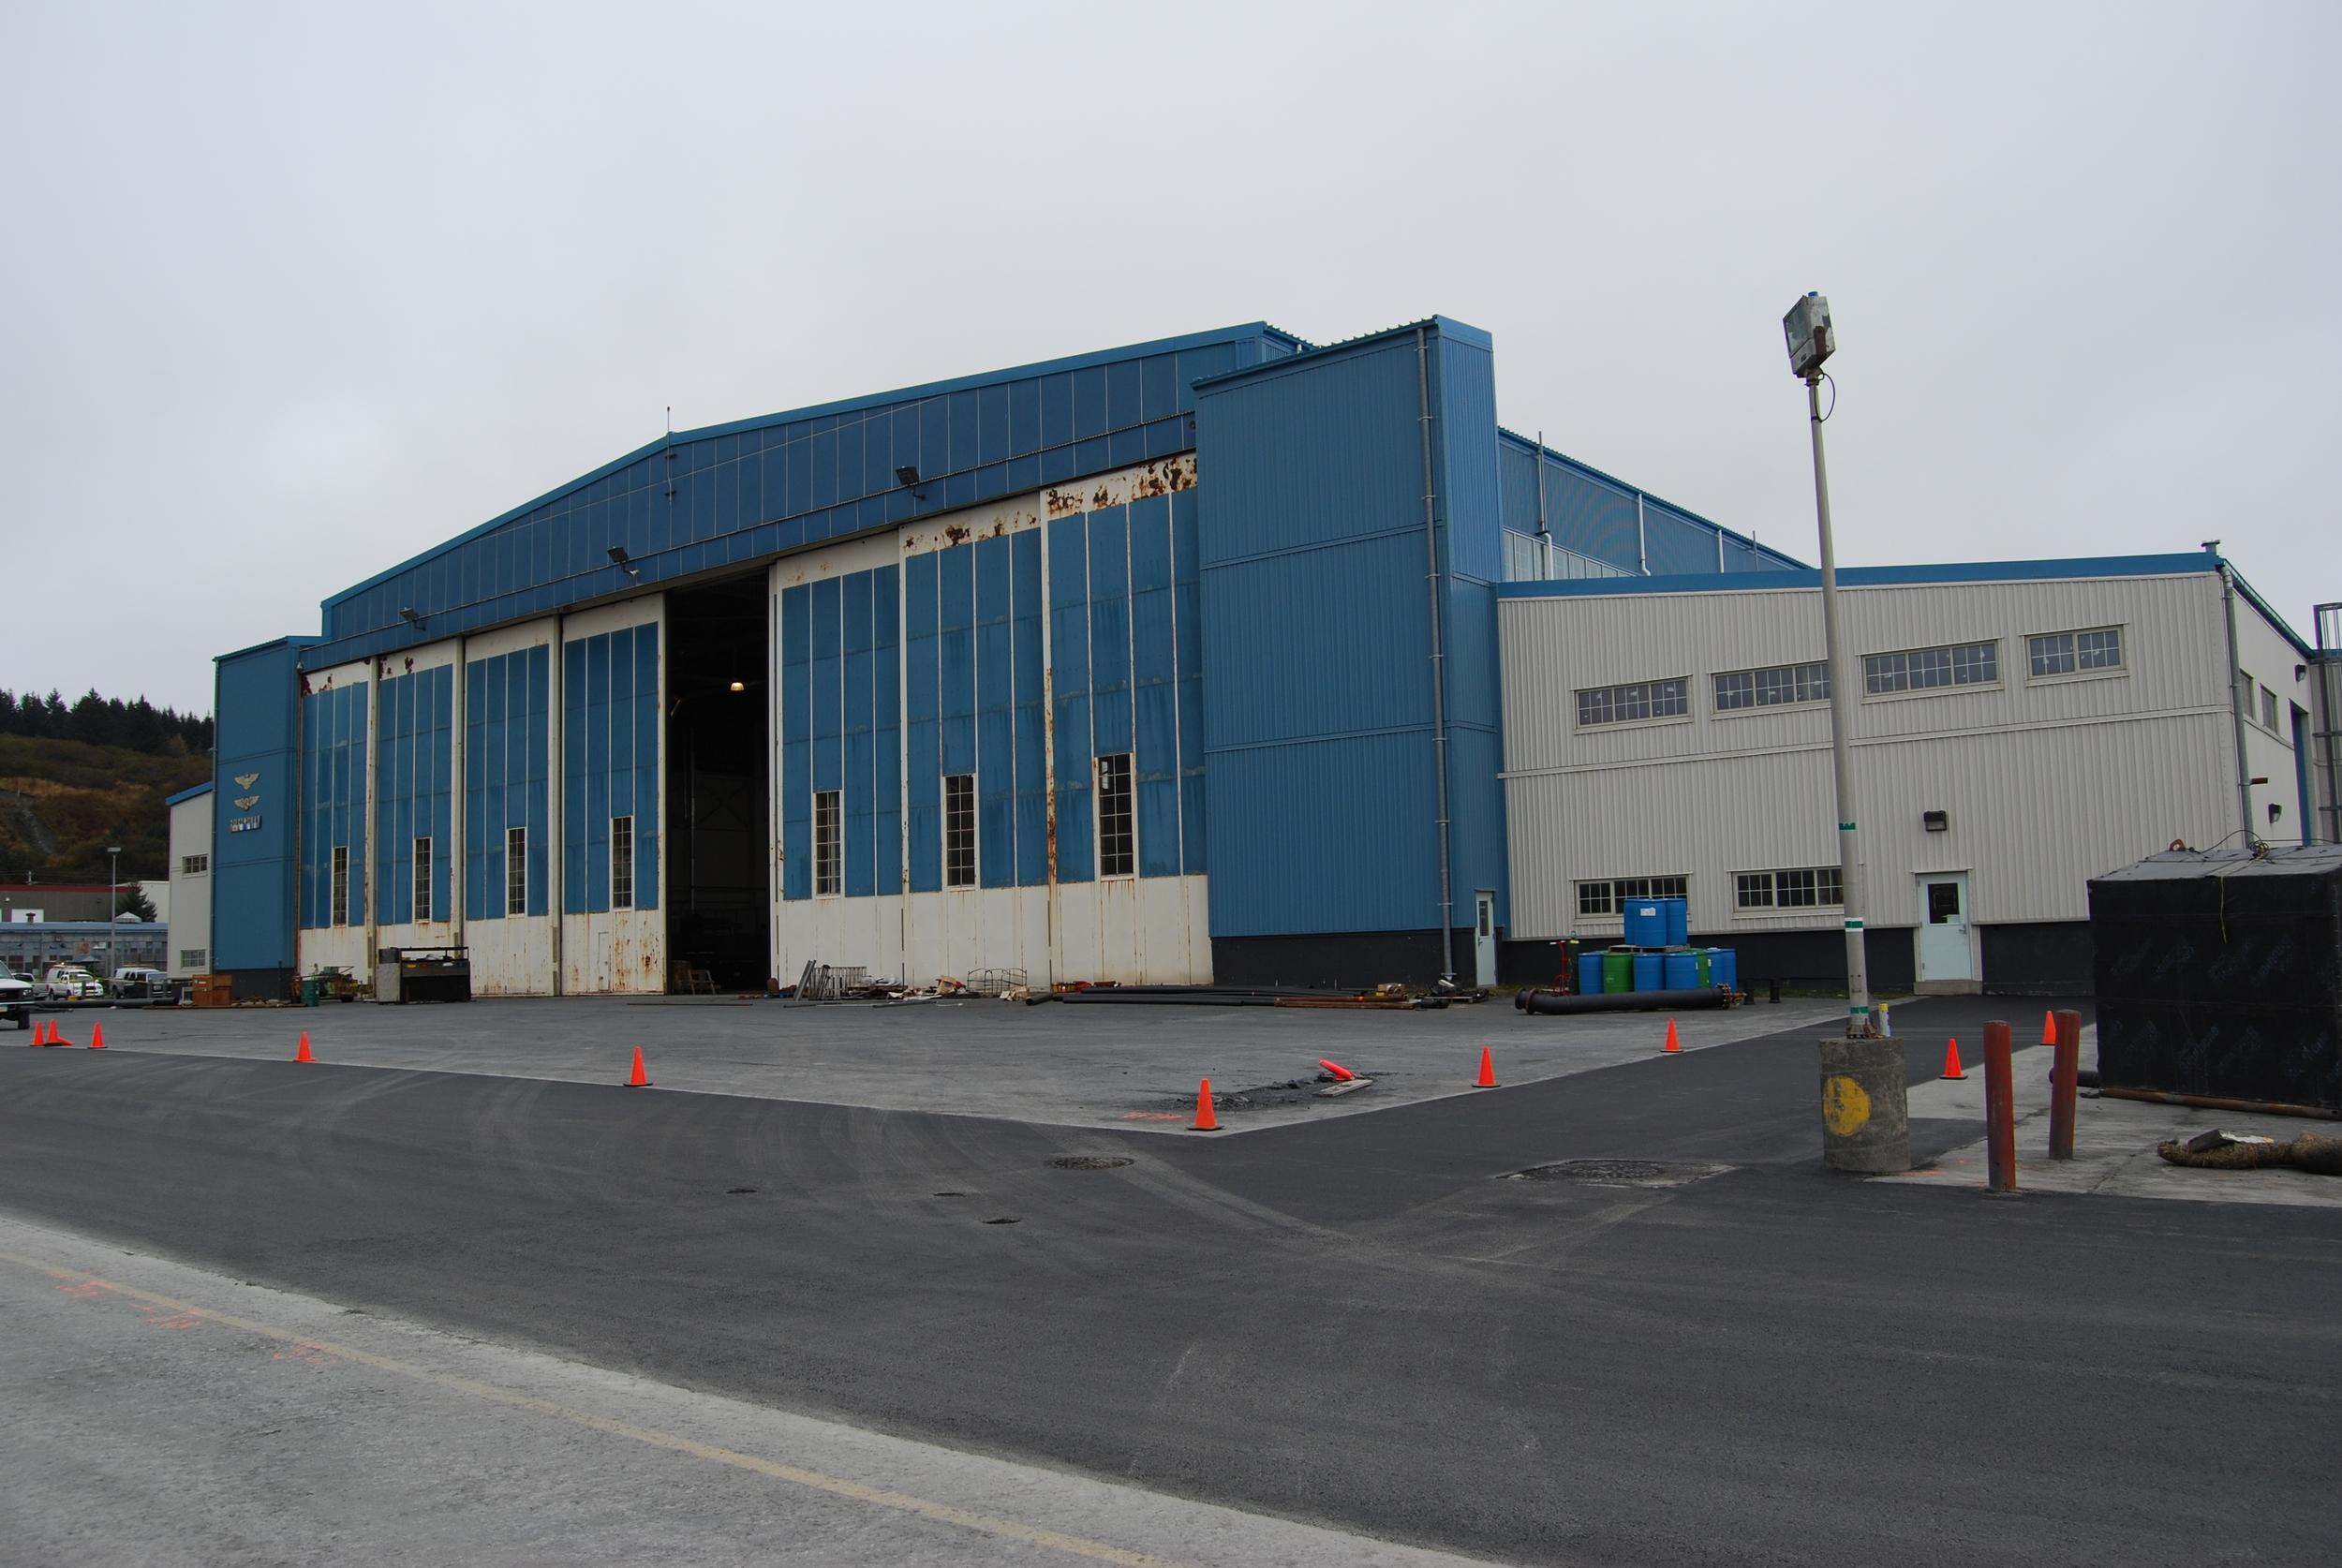 Existing Building 20 Exterior